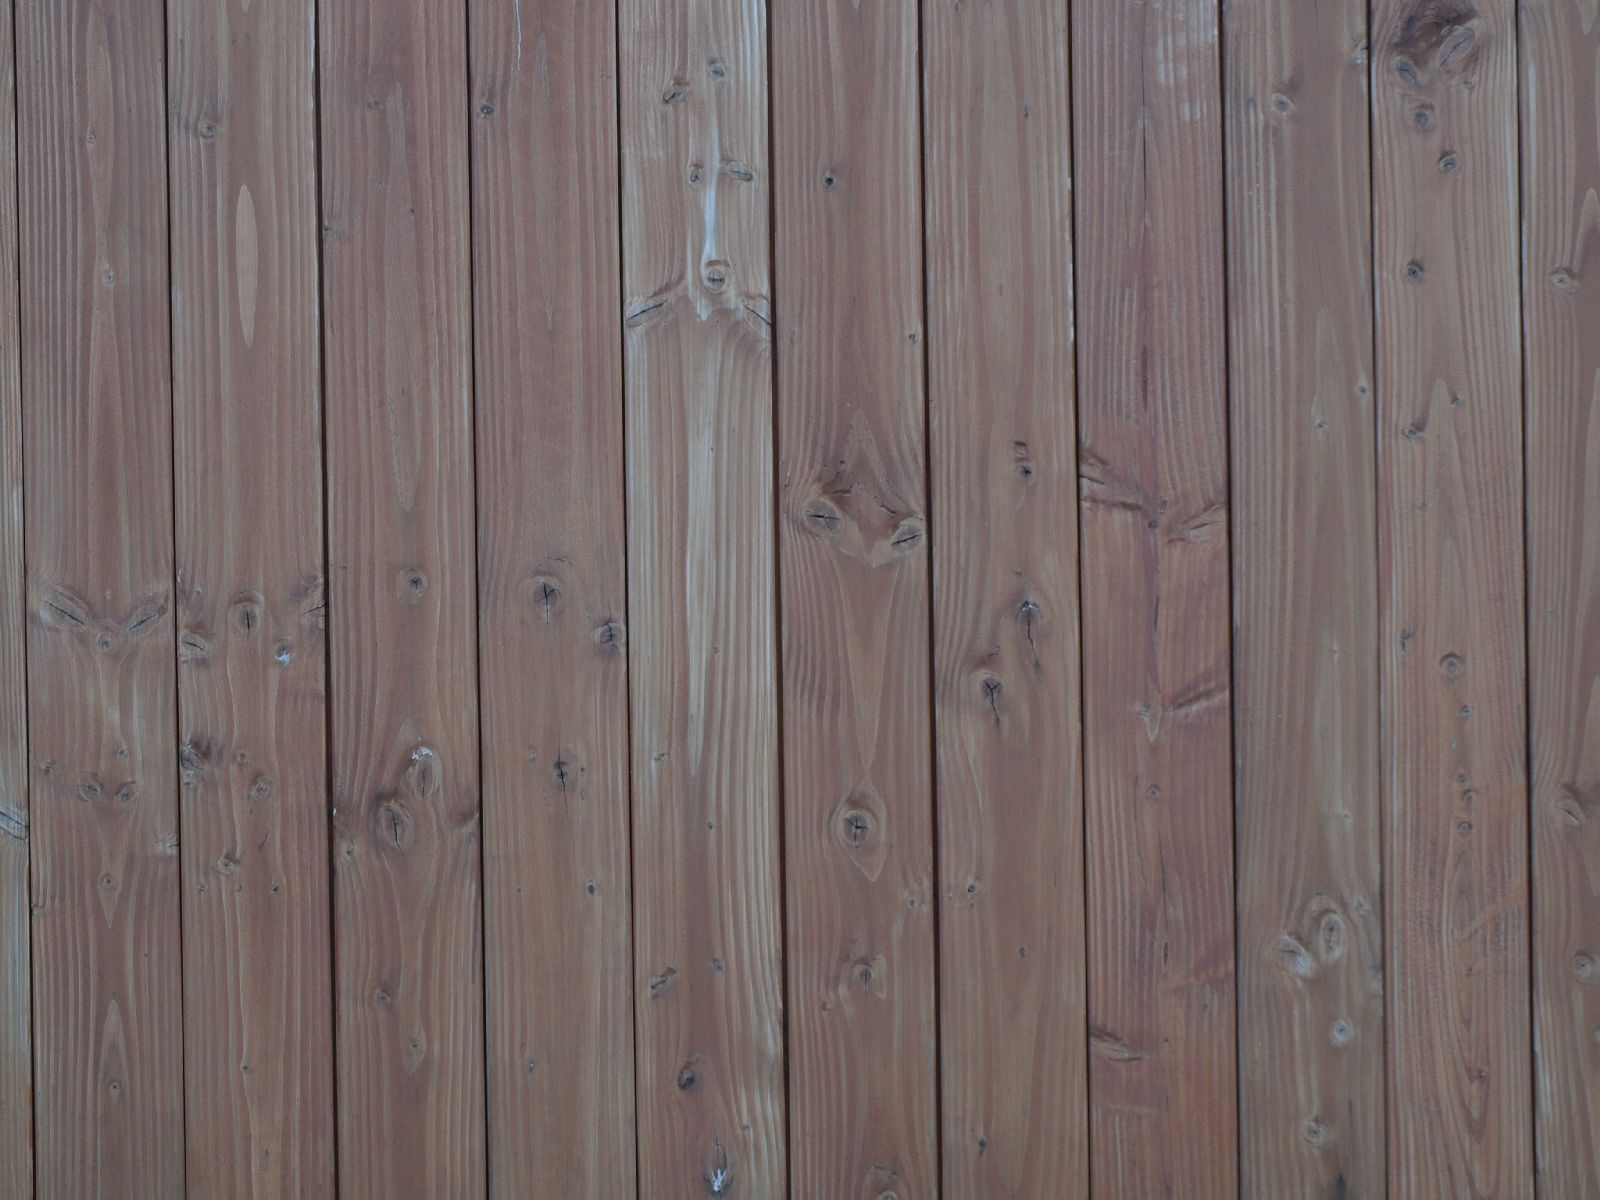 Wood_Texture_A_P7053948